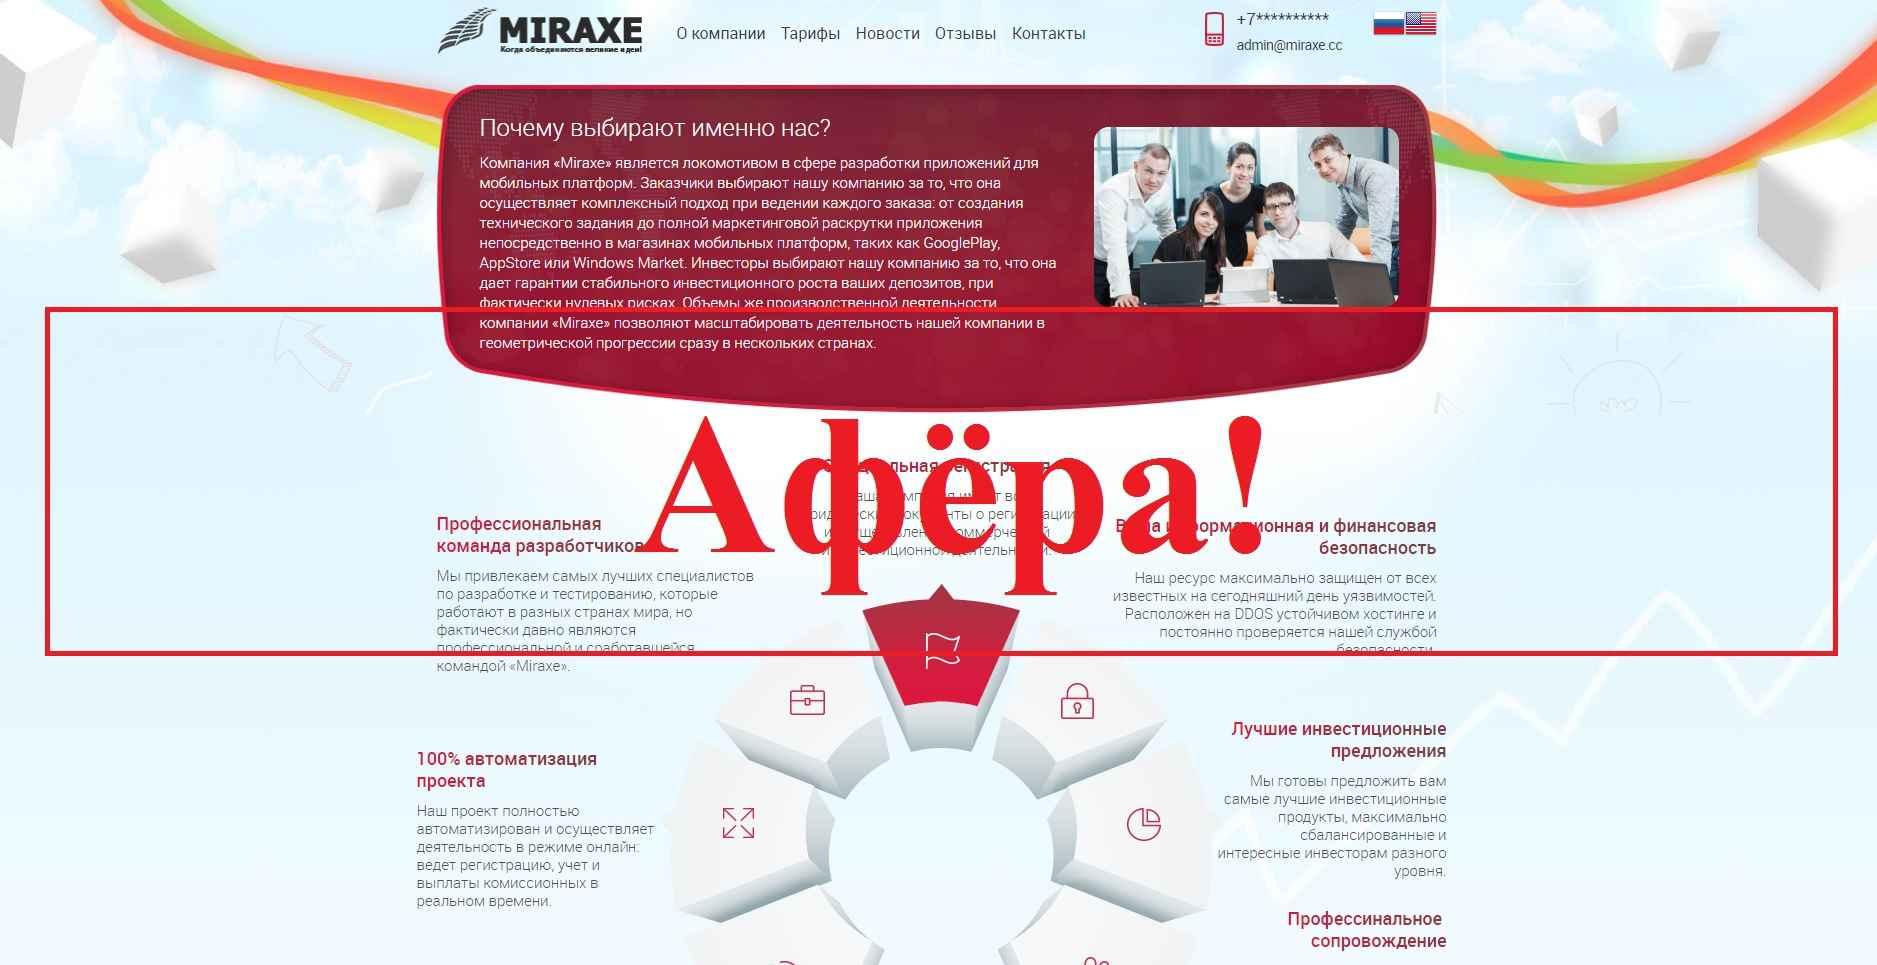 Miraxe – отзывы. Инвестиции в miraxe.cc